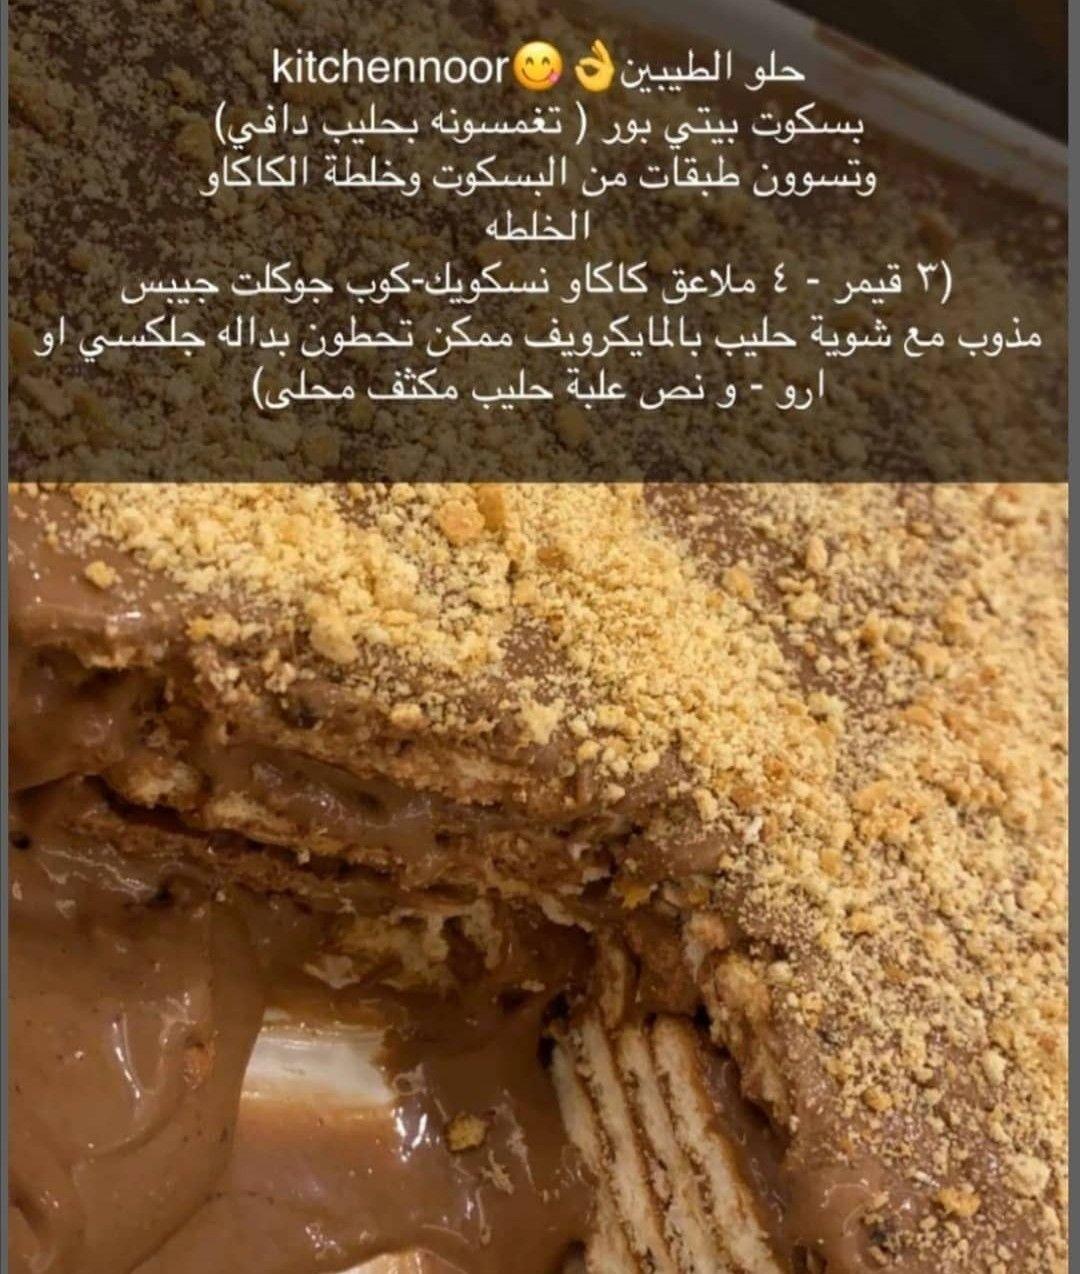 Pin By Haidy On حالي ومالح Food Receipes Food Desserts